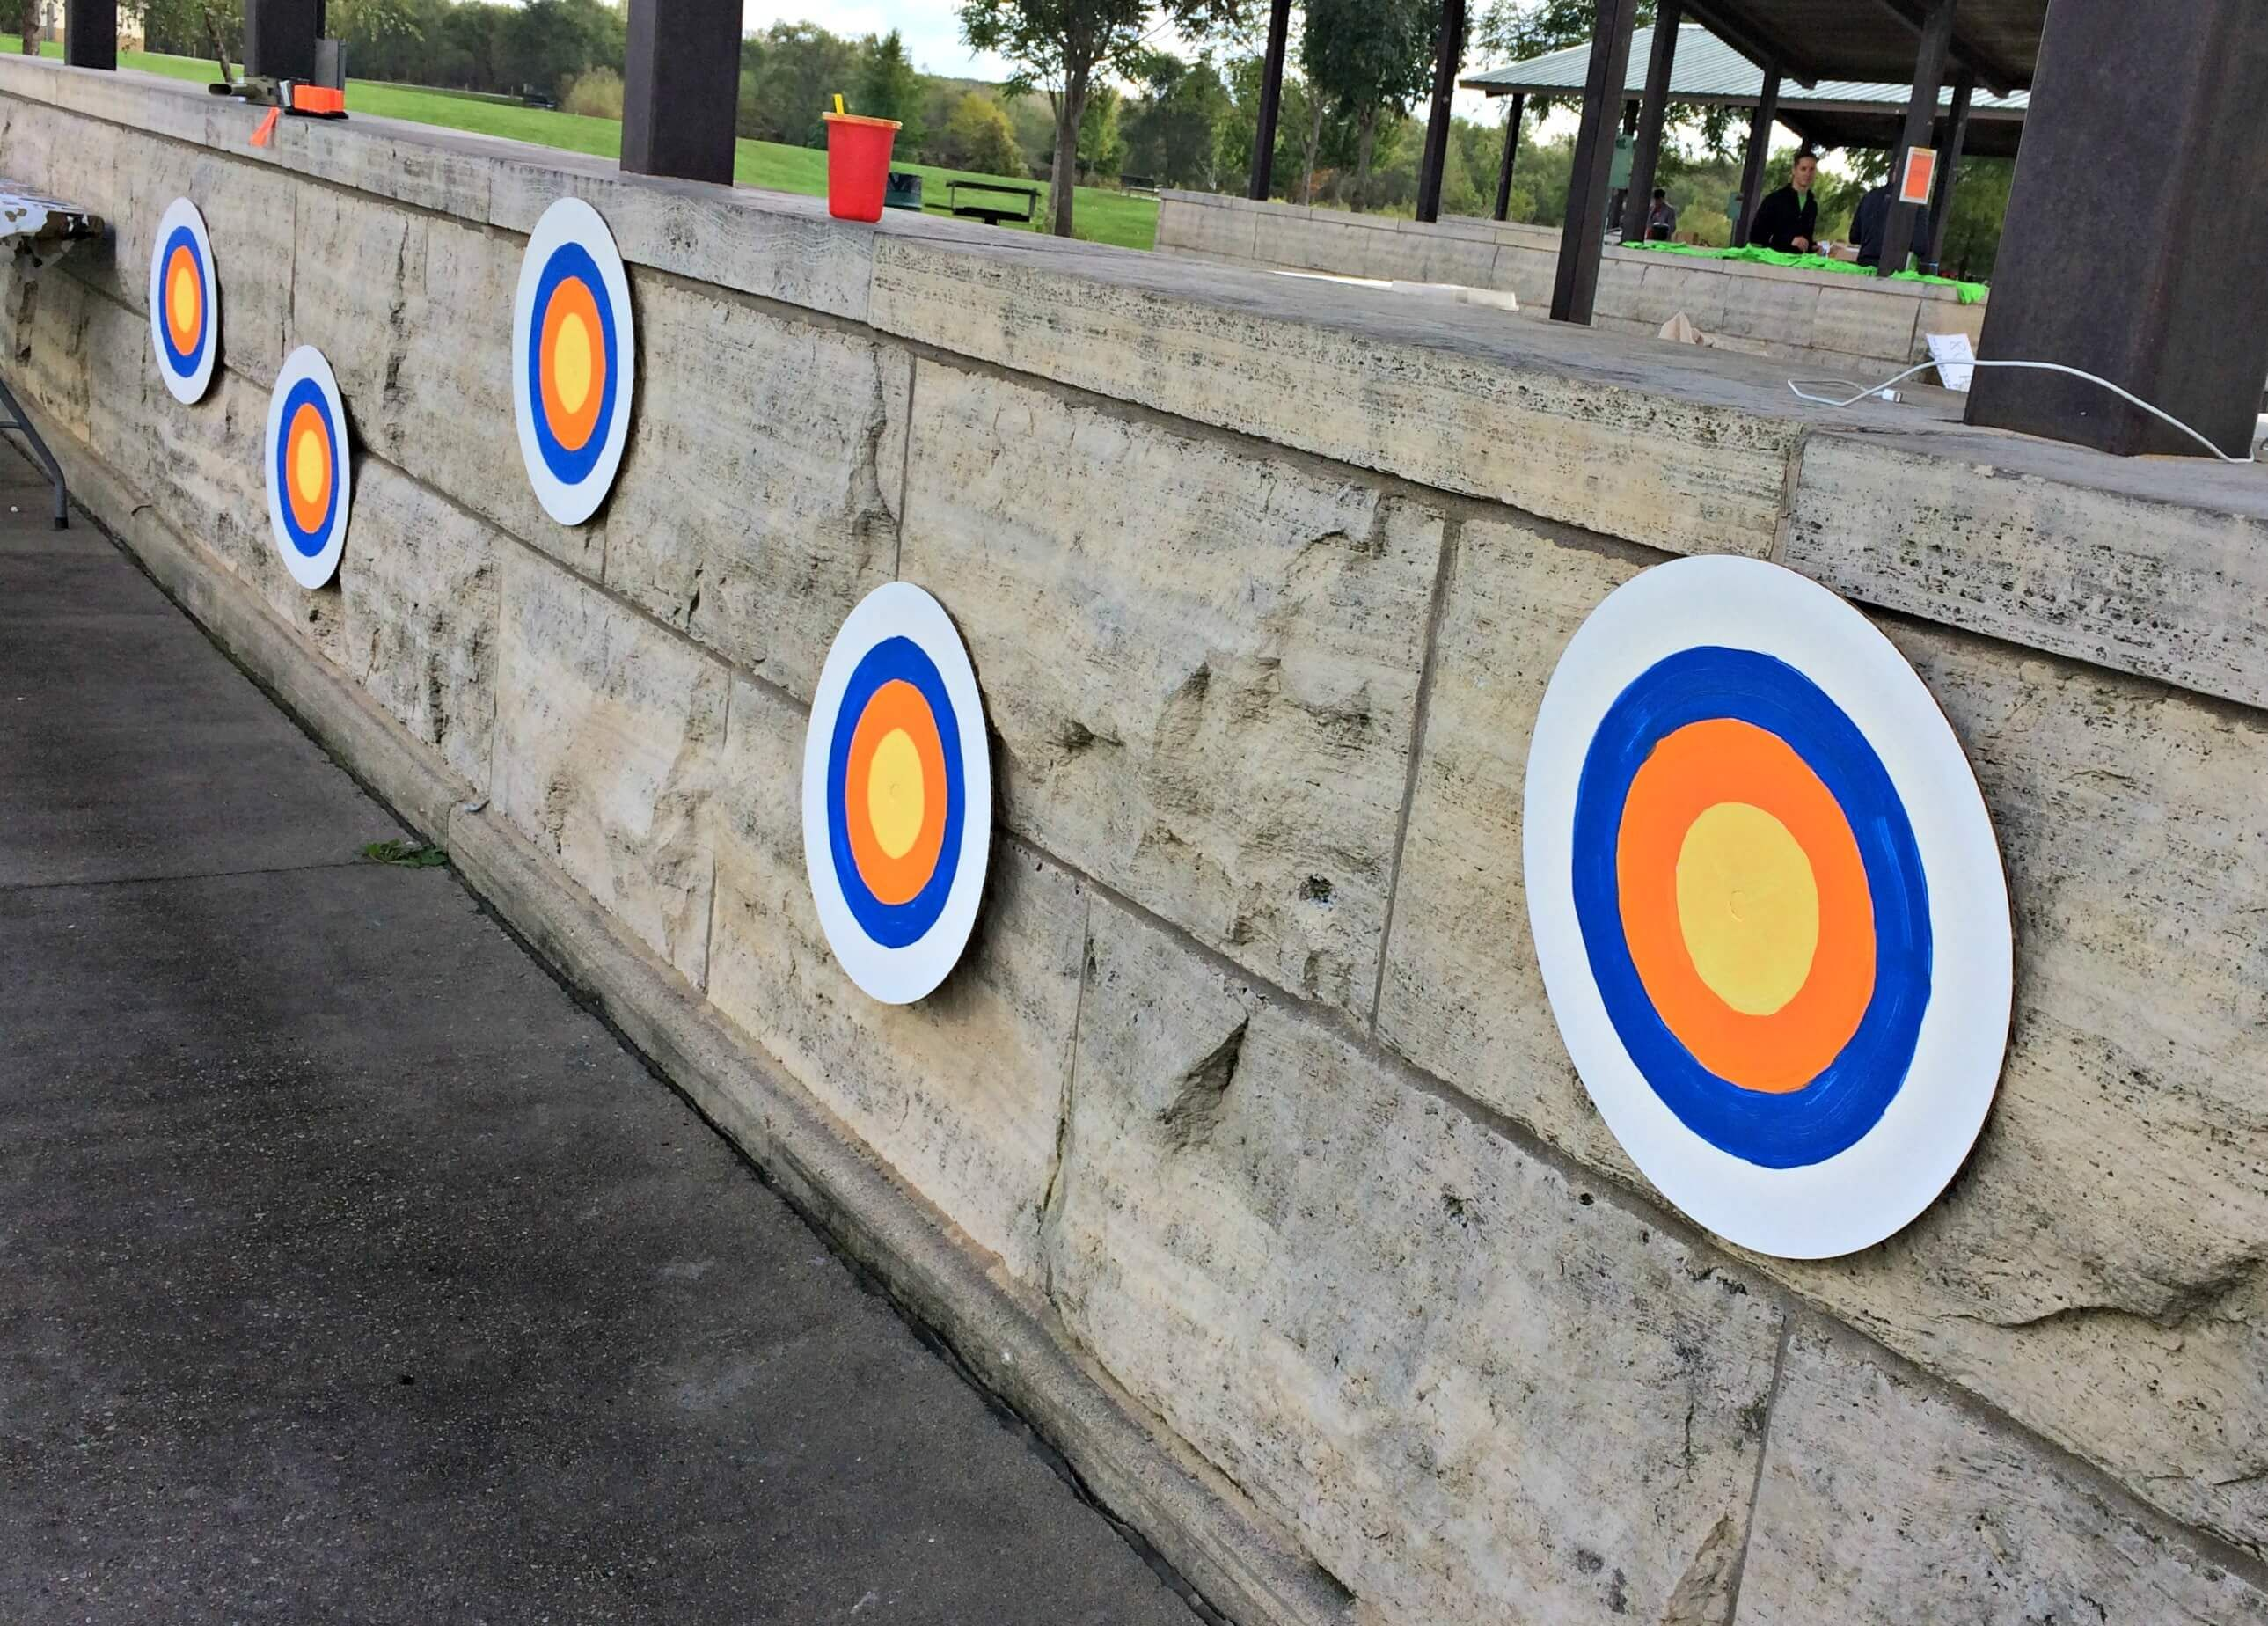 Nerf Party Bullseye Targets - target practice